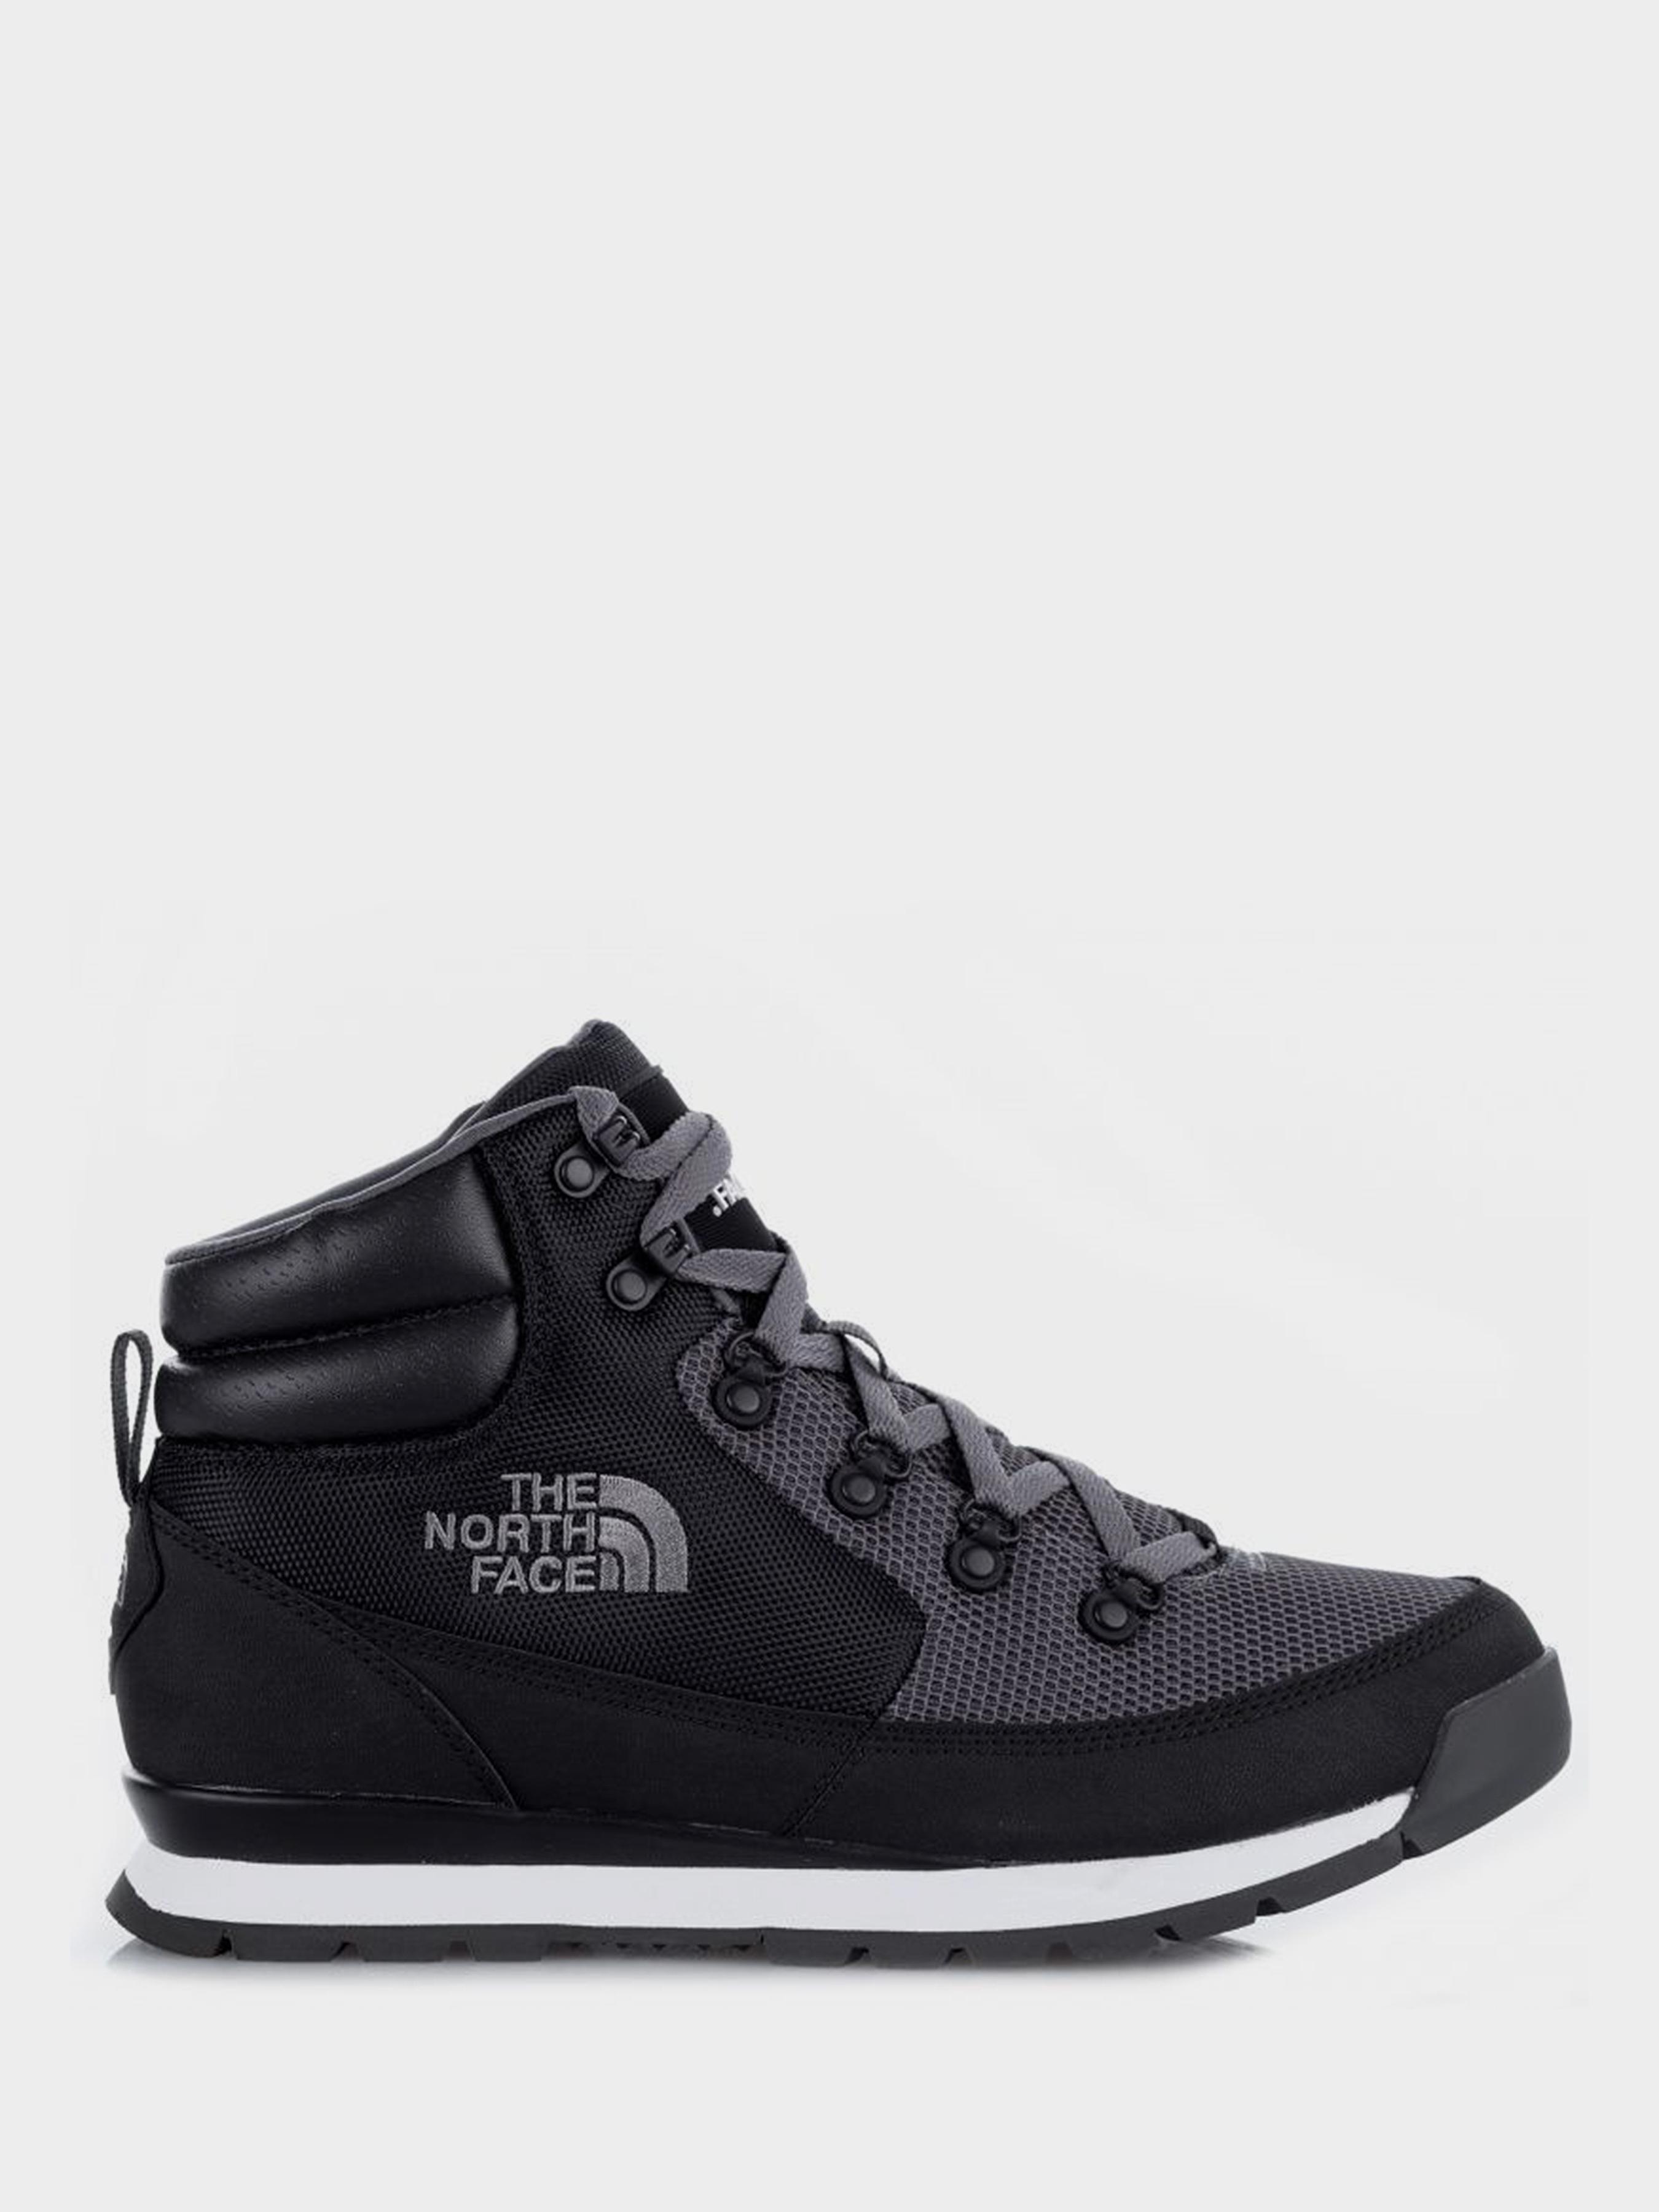 Ботинки для мужчин The North Face B-TO-B REDX MESH NT80 модная обувь, 2017